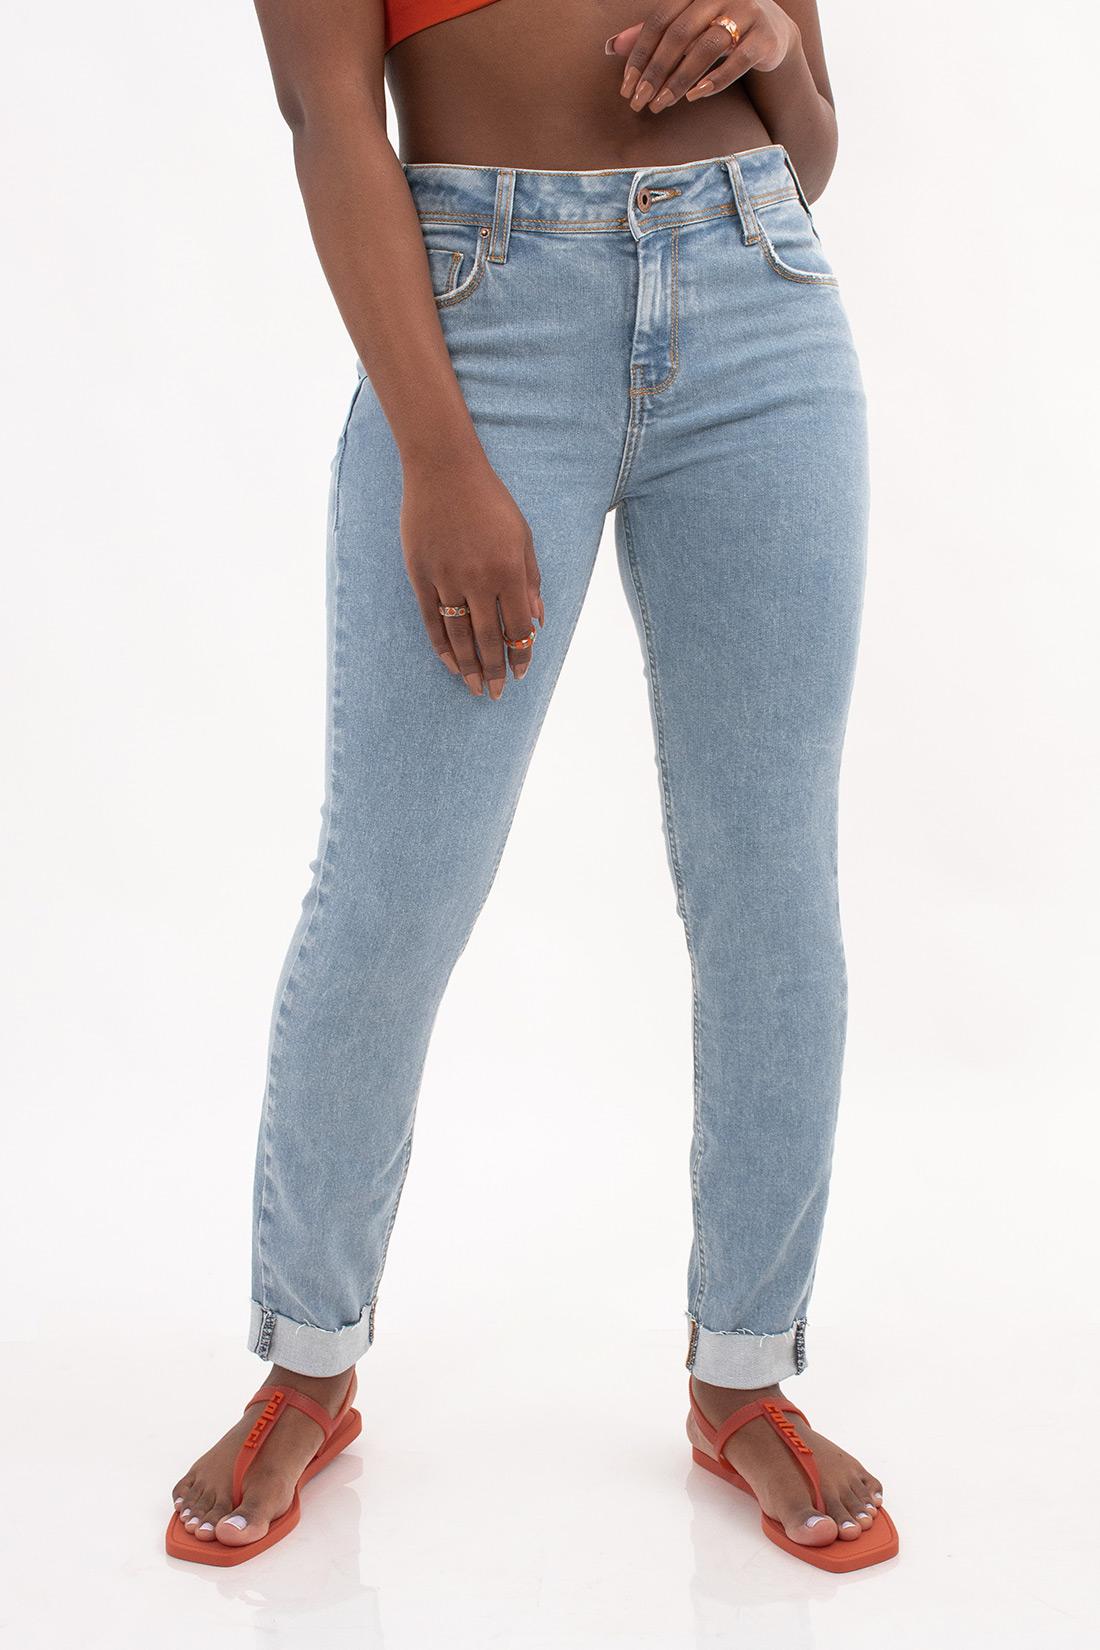 Calca Jeans Sommer Bruna Com Dobra